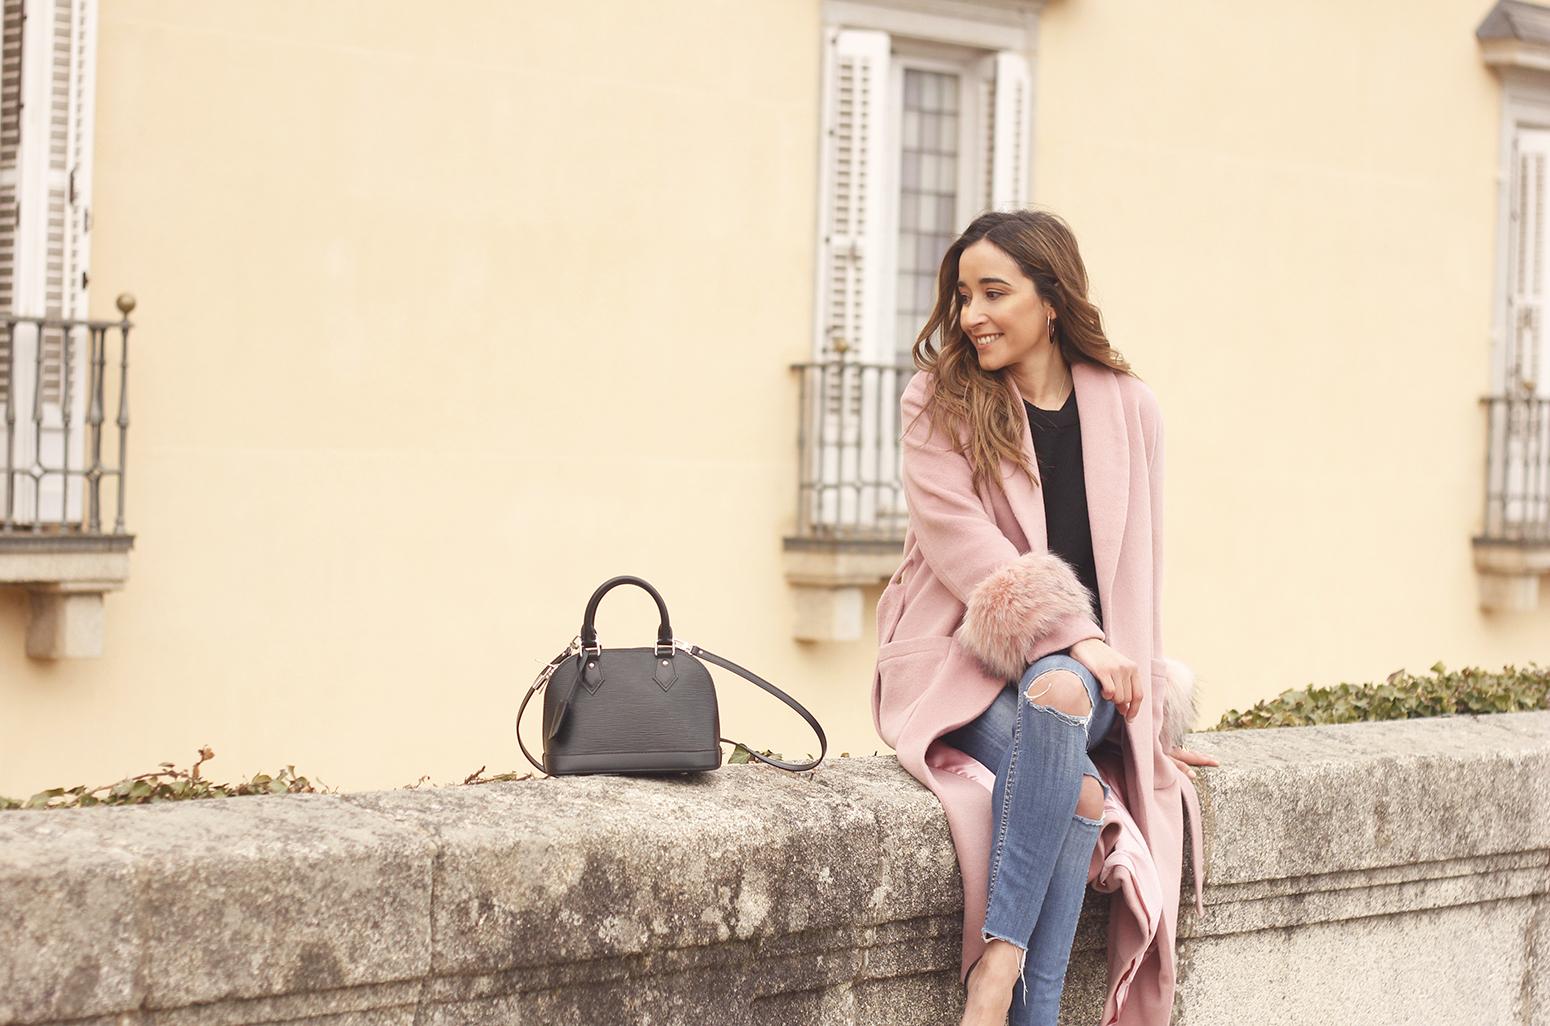 pink coat byleclair carolina herrera heels jeans louis vuitton ba street style outfit 201910